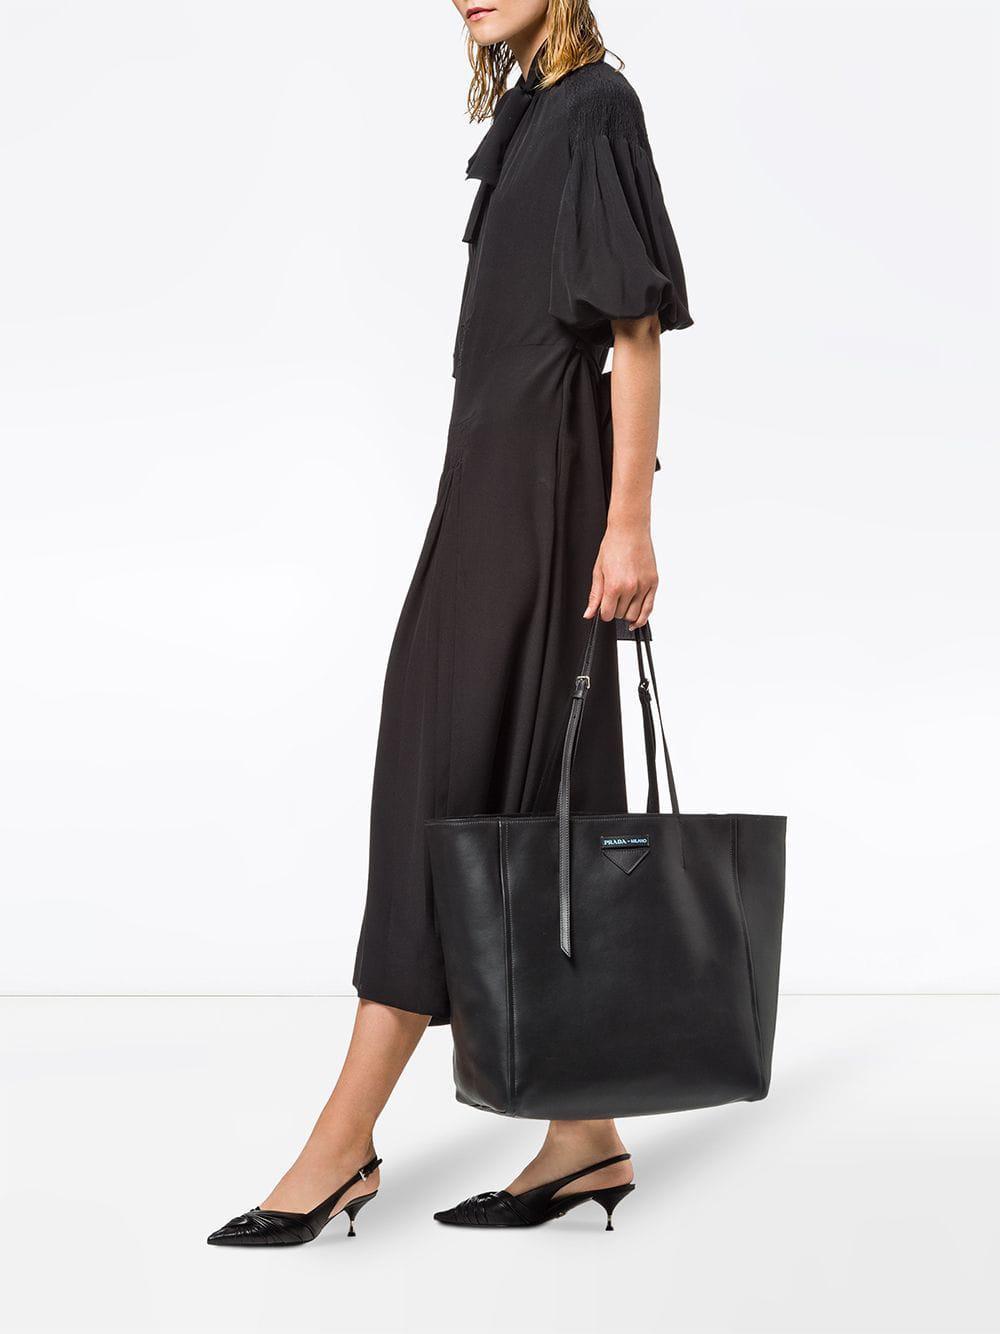 730685d6e1d8 Prada - Black Large Concept Leather Tote - Lyst. View fullscreen